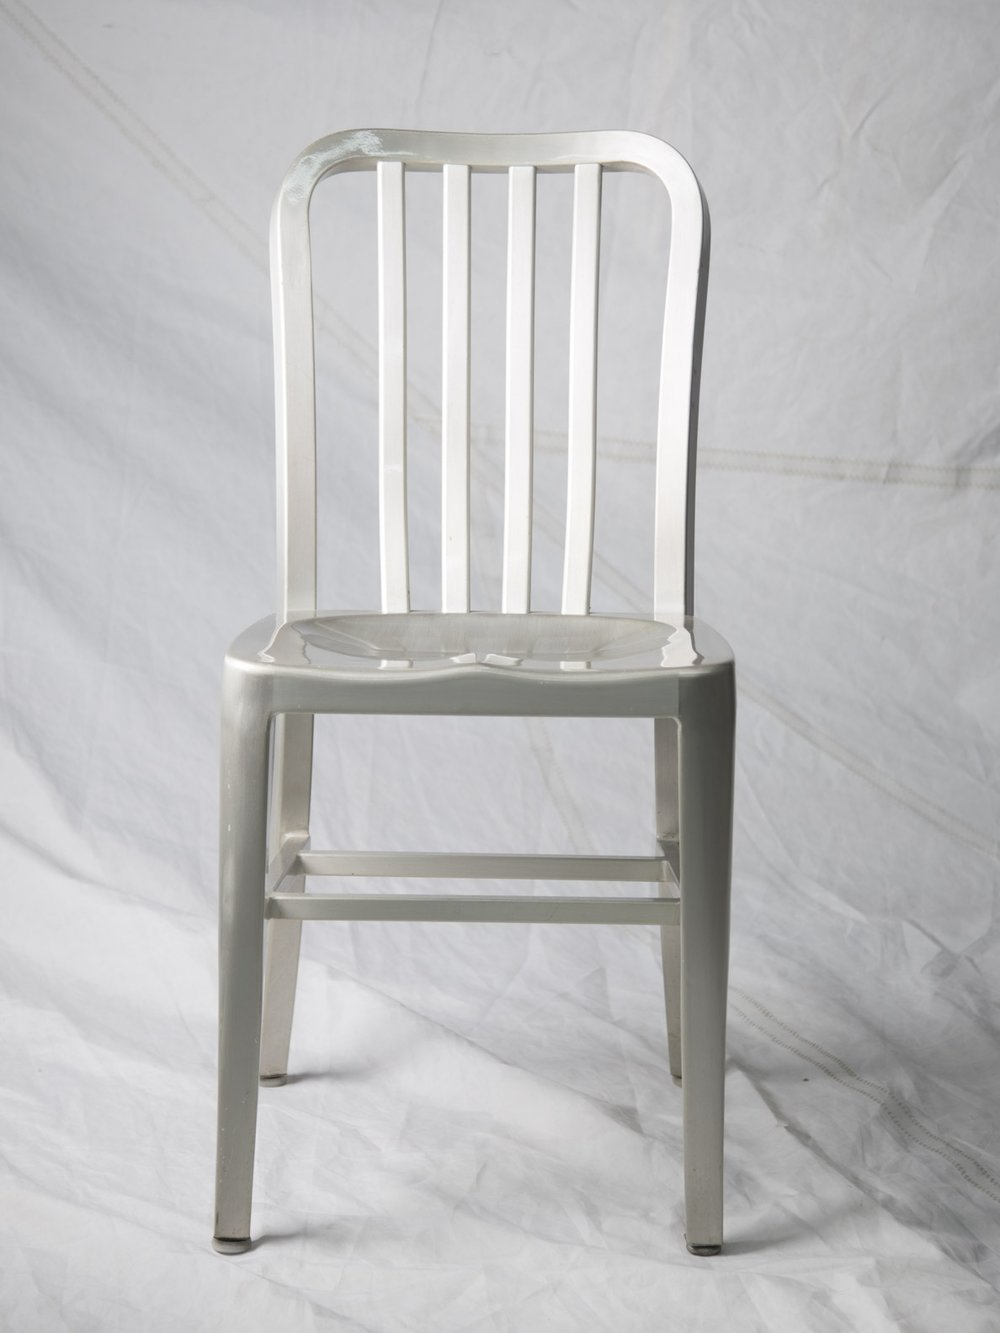 CH061  Vintage aluminum side chair   $75/week Set of 1